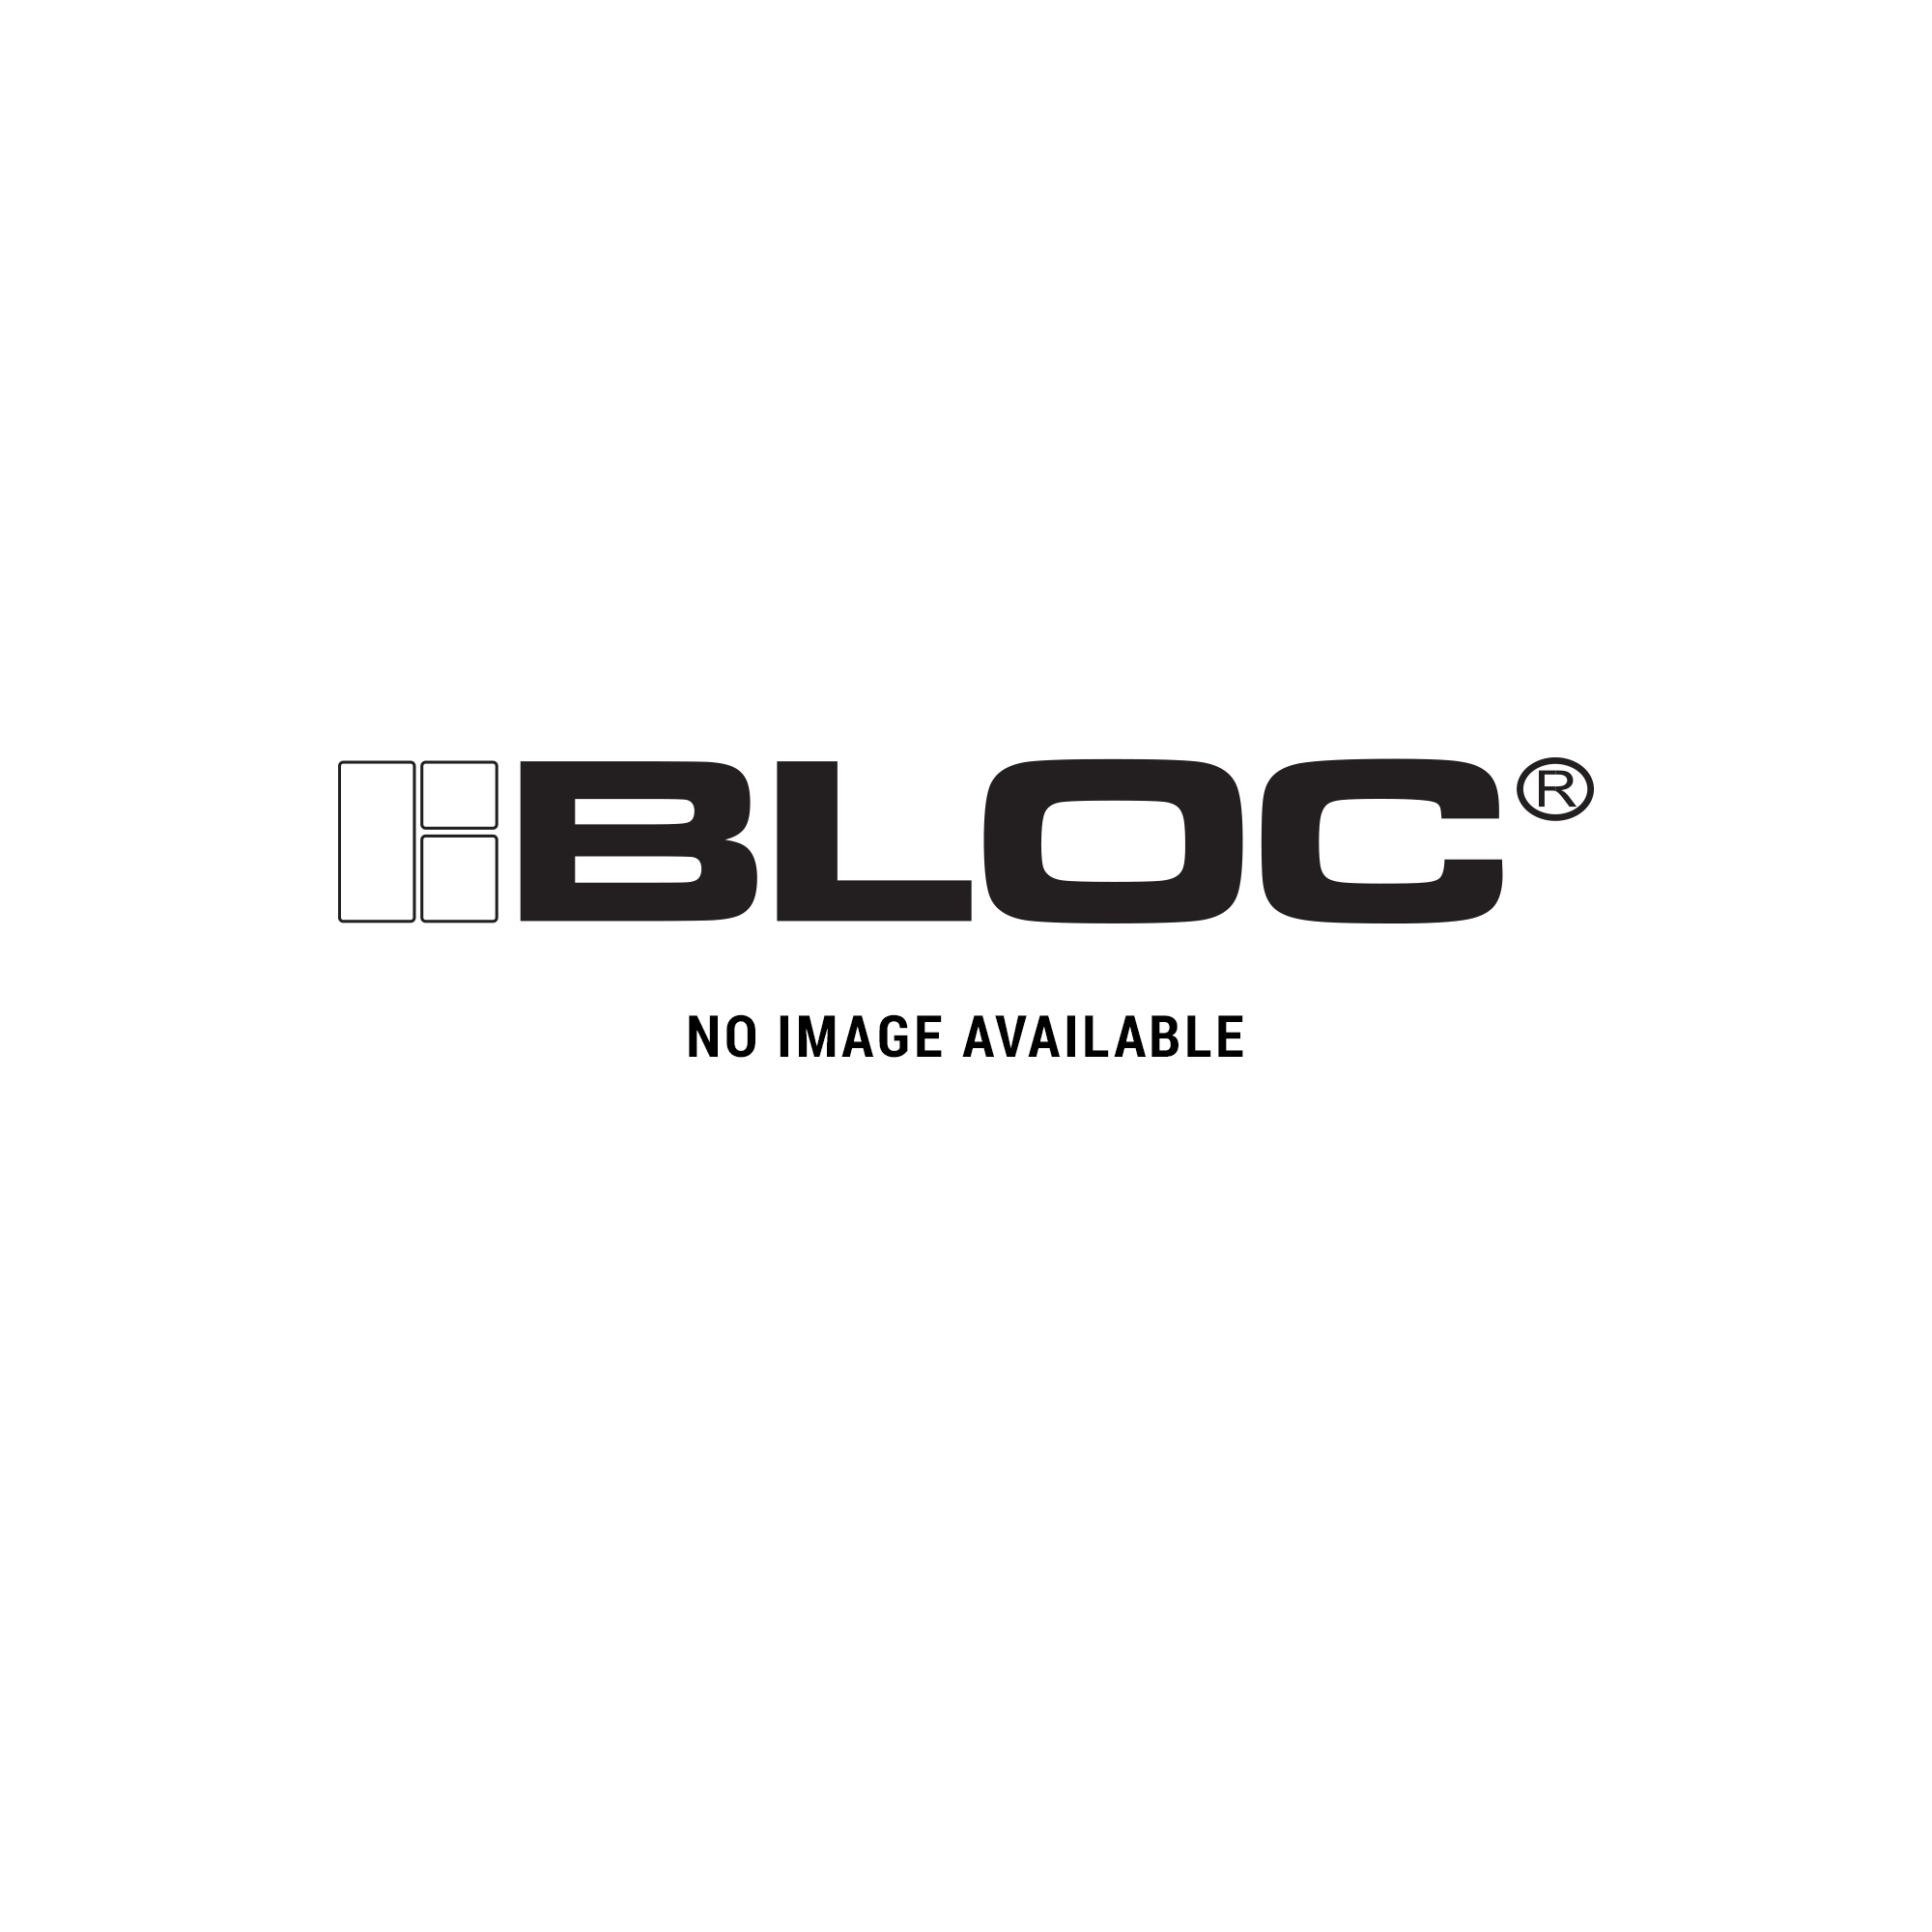 5f195edfced Home · Sunglasses · Capricorn  Bloc Capricorn F216N. Tap image to zoom